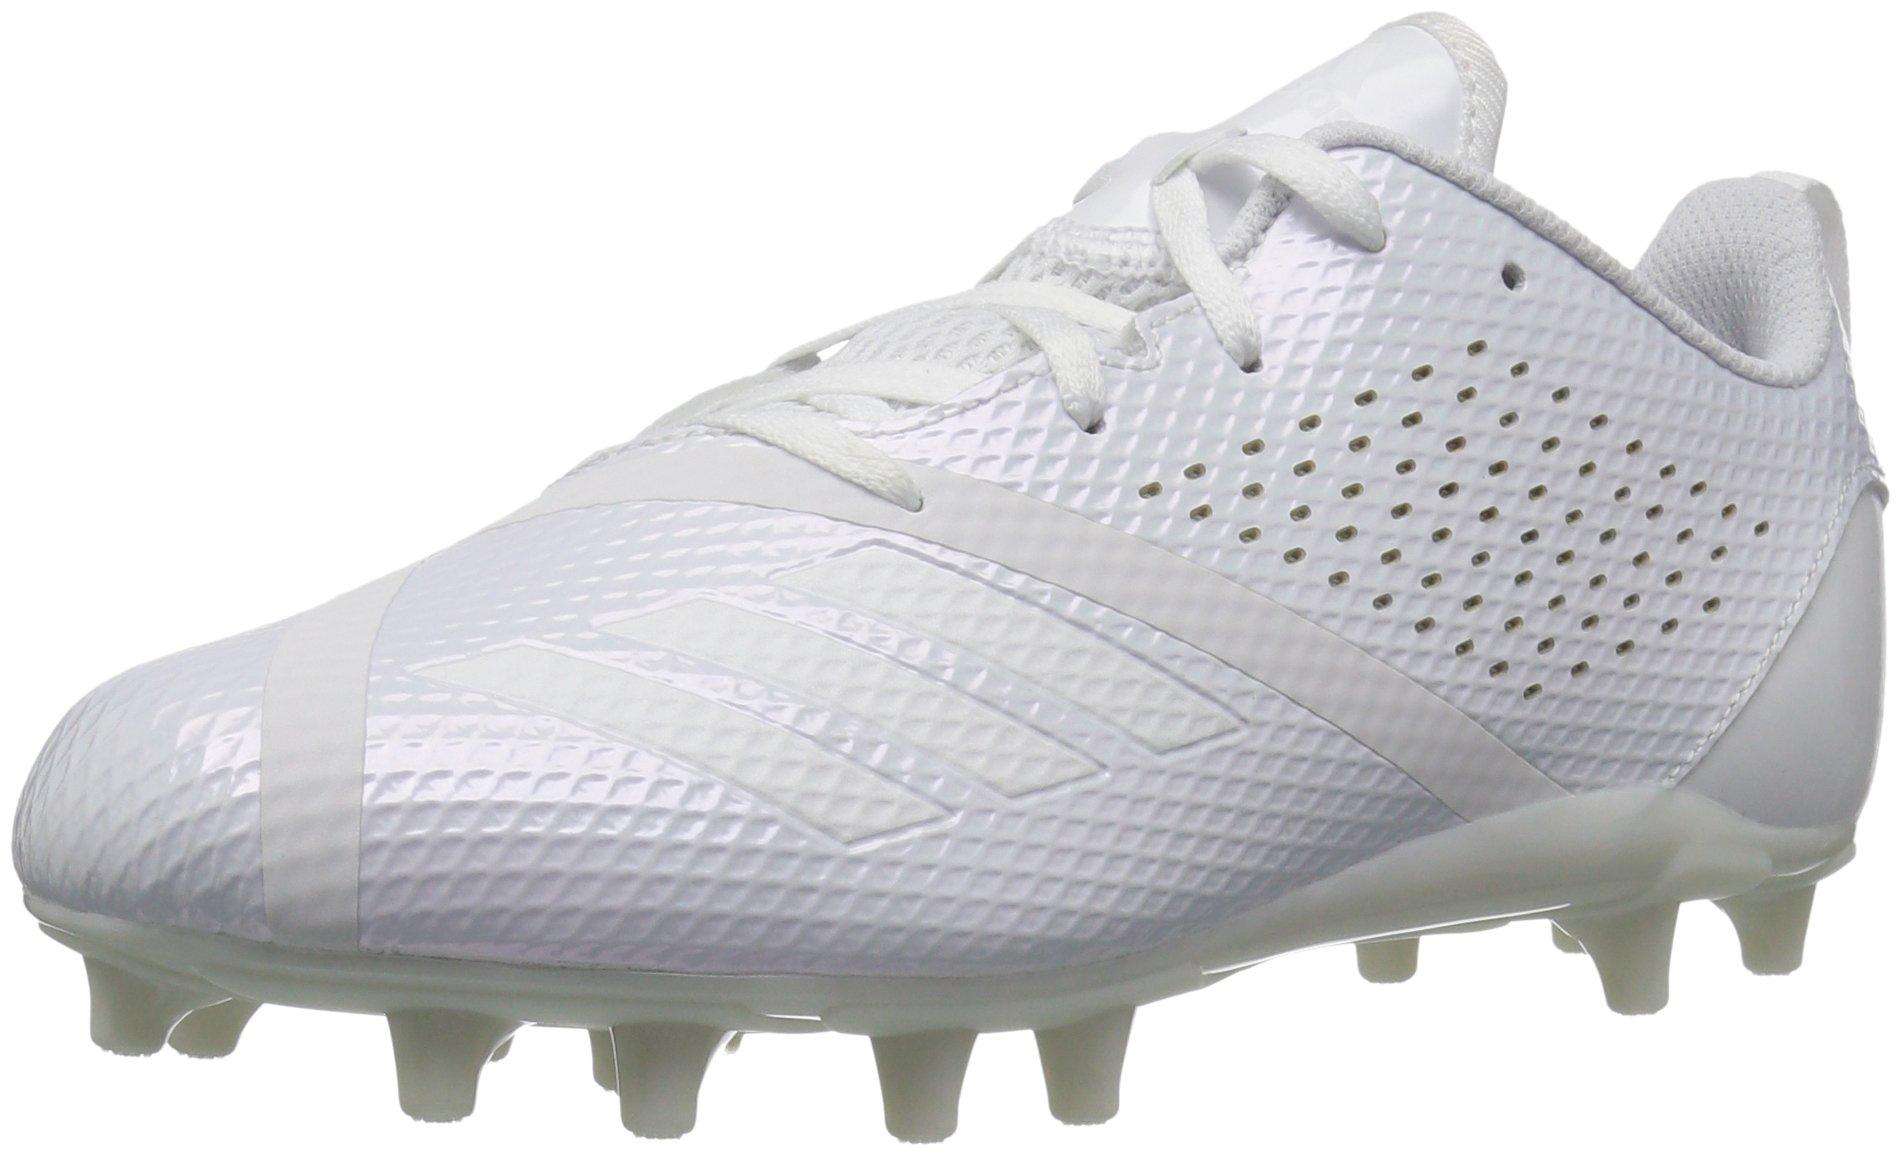 adidas Boys' Adizero 5.5 Star 7.0 Football Shoe, White, 2 M US Little Kid